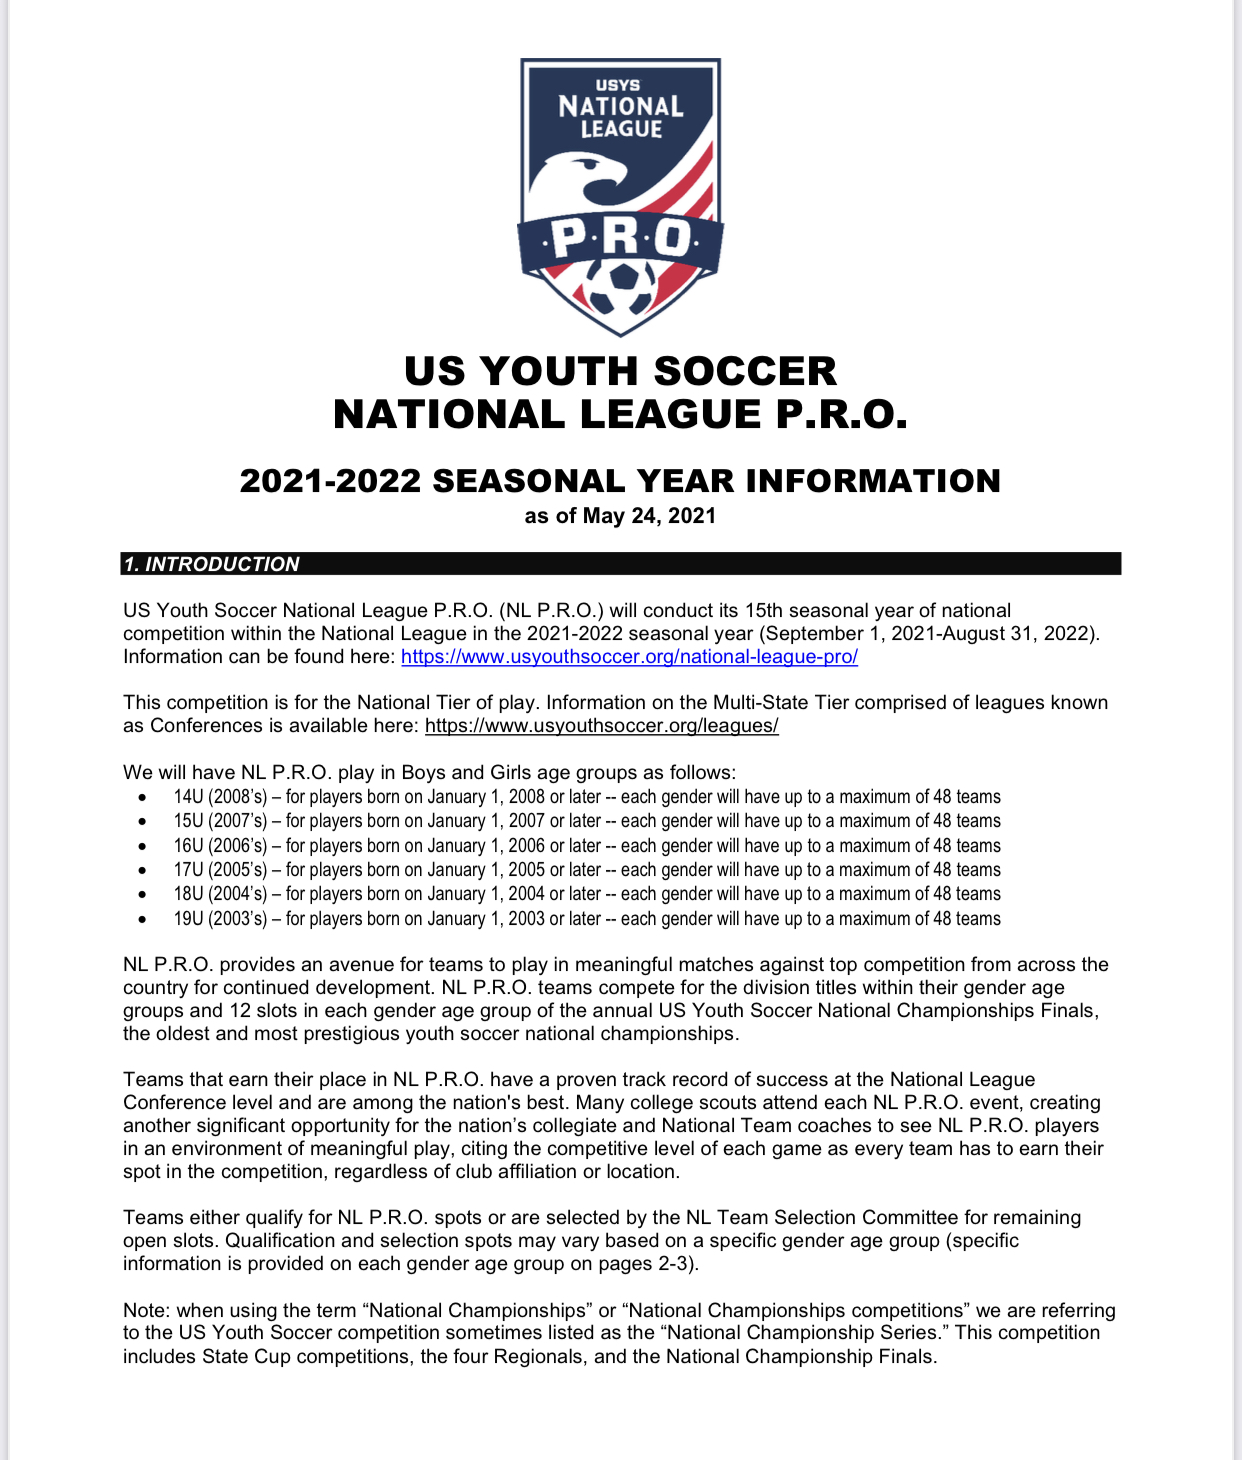 2021-2022 Seasonal Year Information